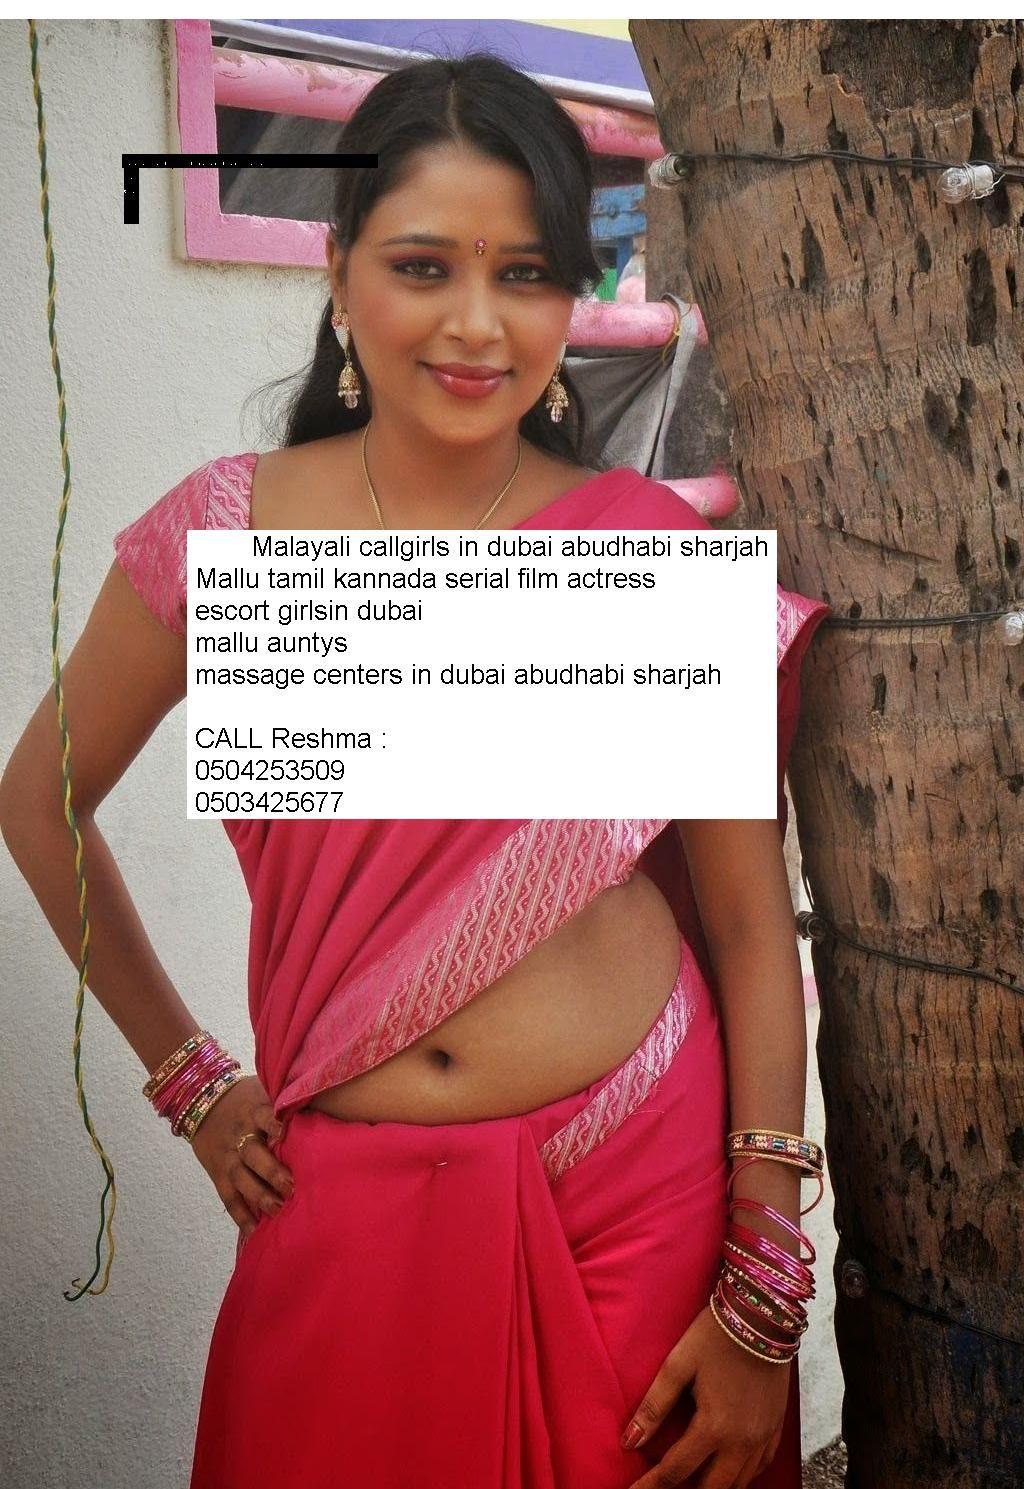 Mallu Call Girls In Dubai